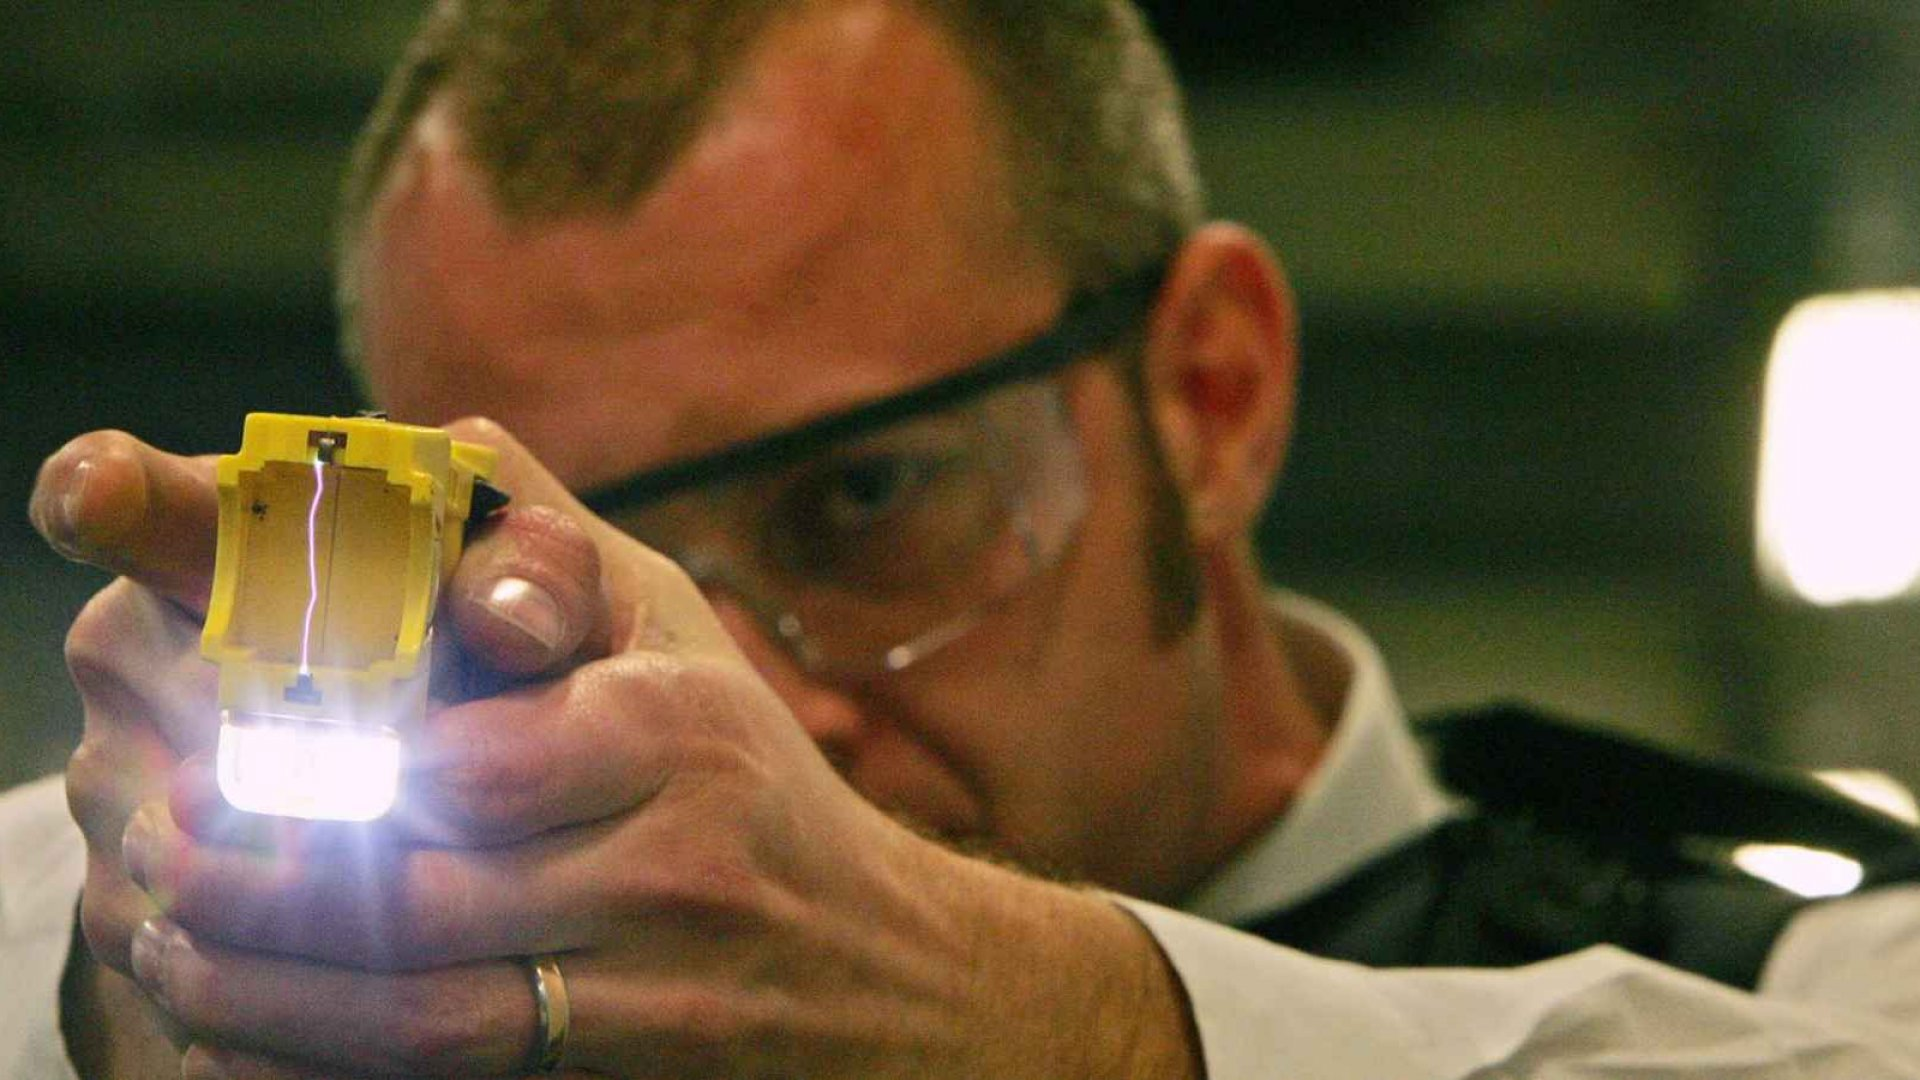 Police Departments Have Questionable Ties to Stun-Gun Maker Taser